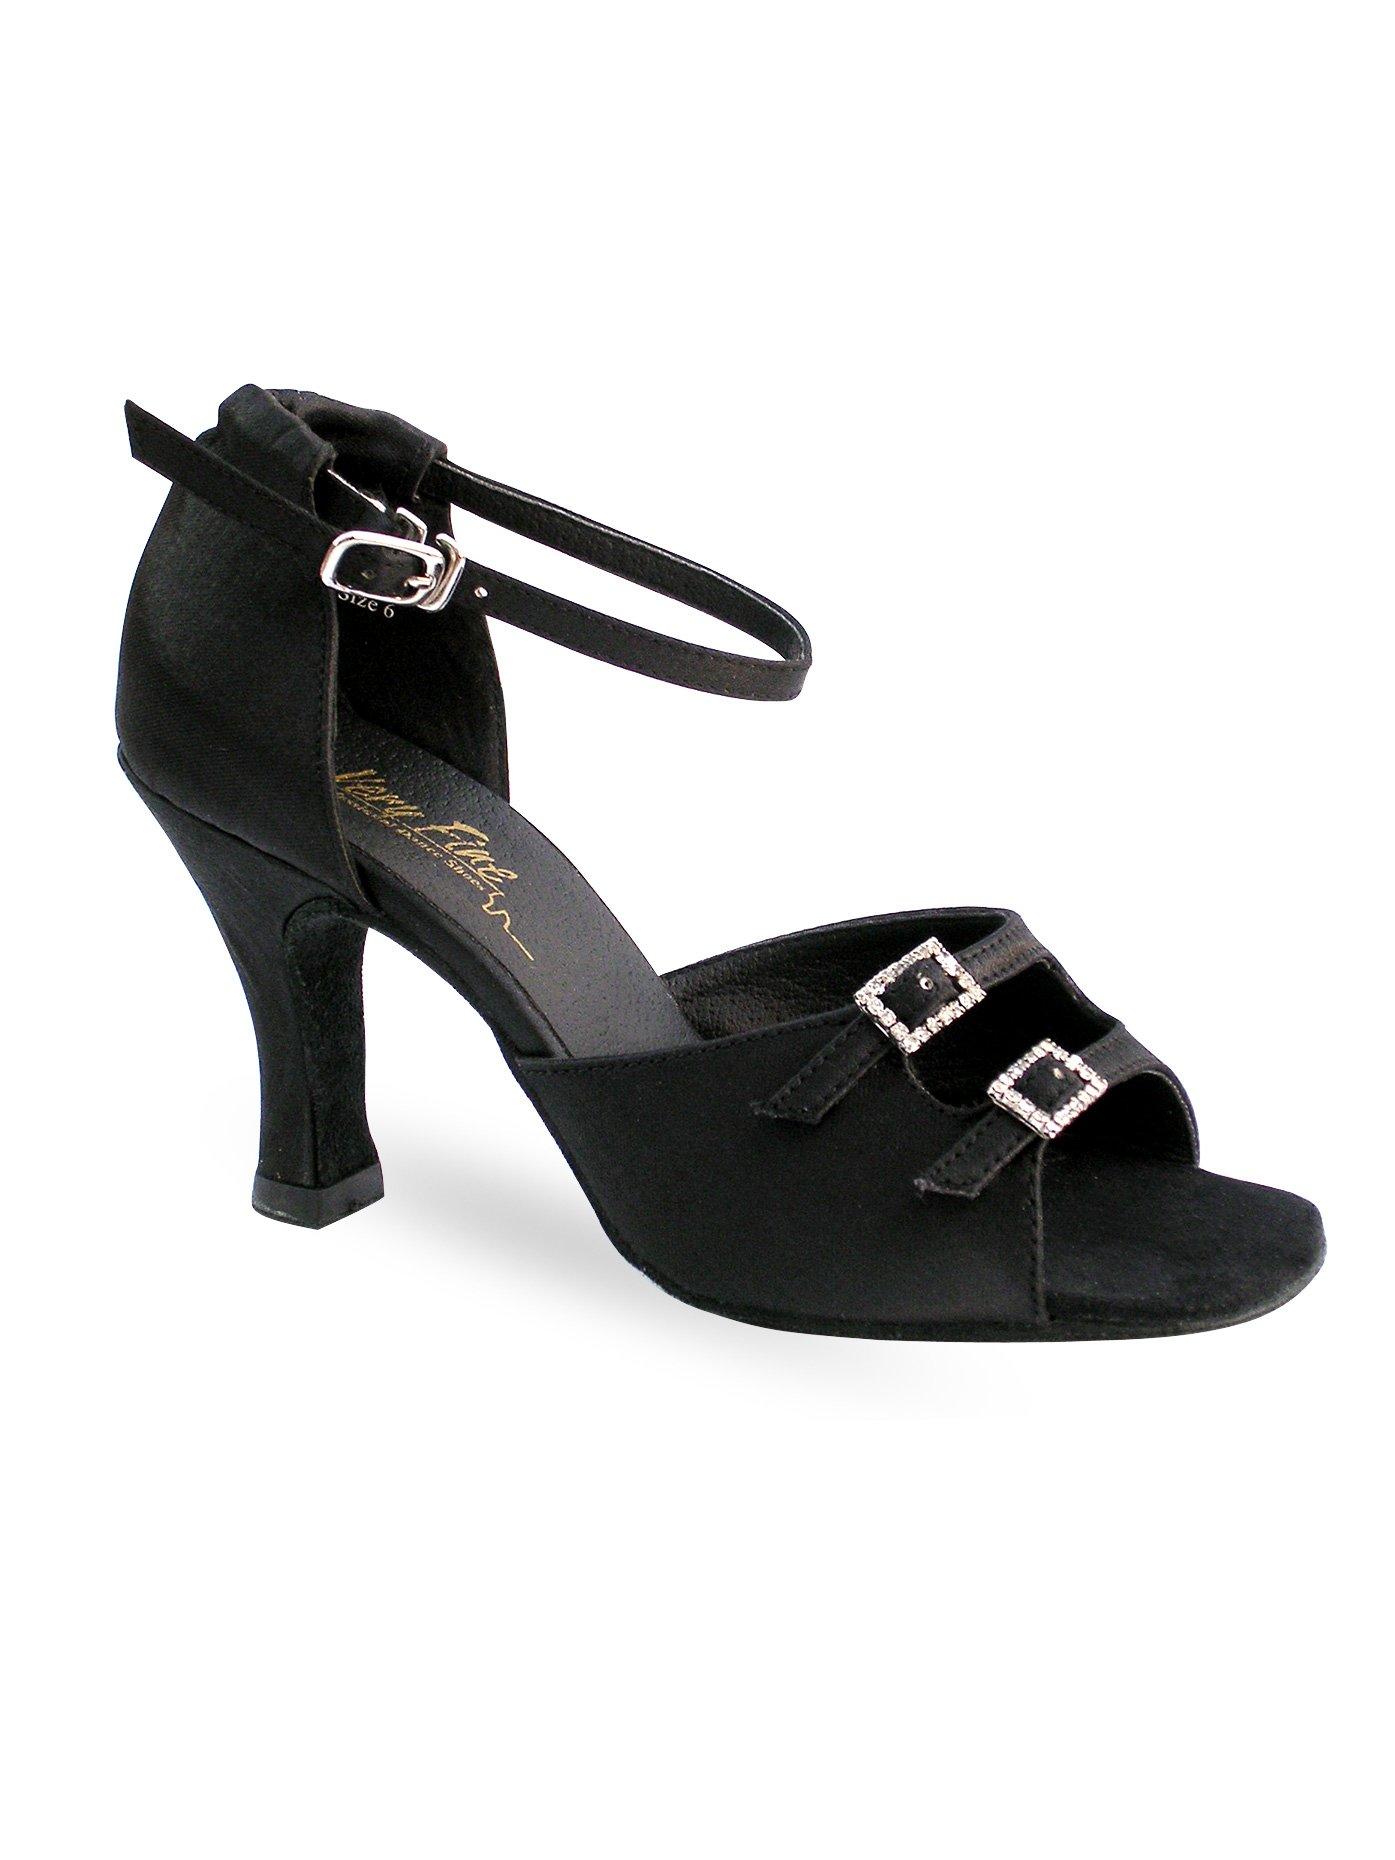 Ladies Latin/Rhythm- Classic Series Ballroom Shoes,1620BR25070,Brown Satin,7.0